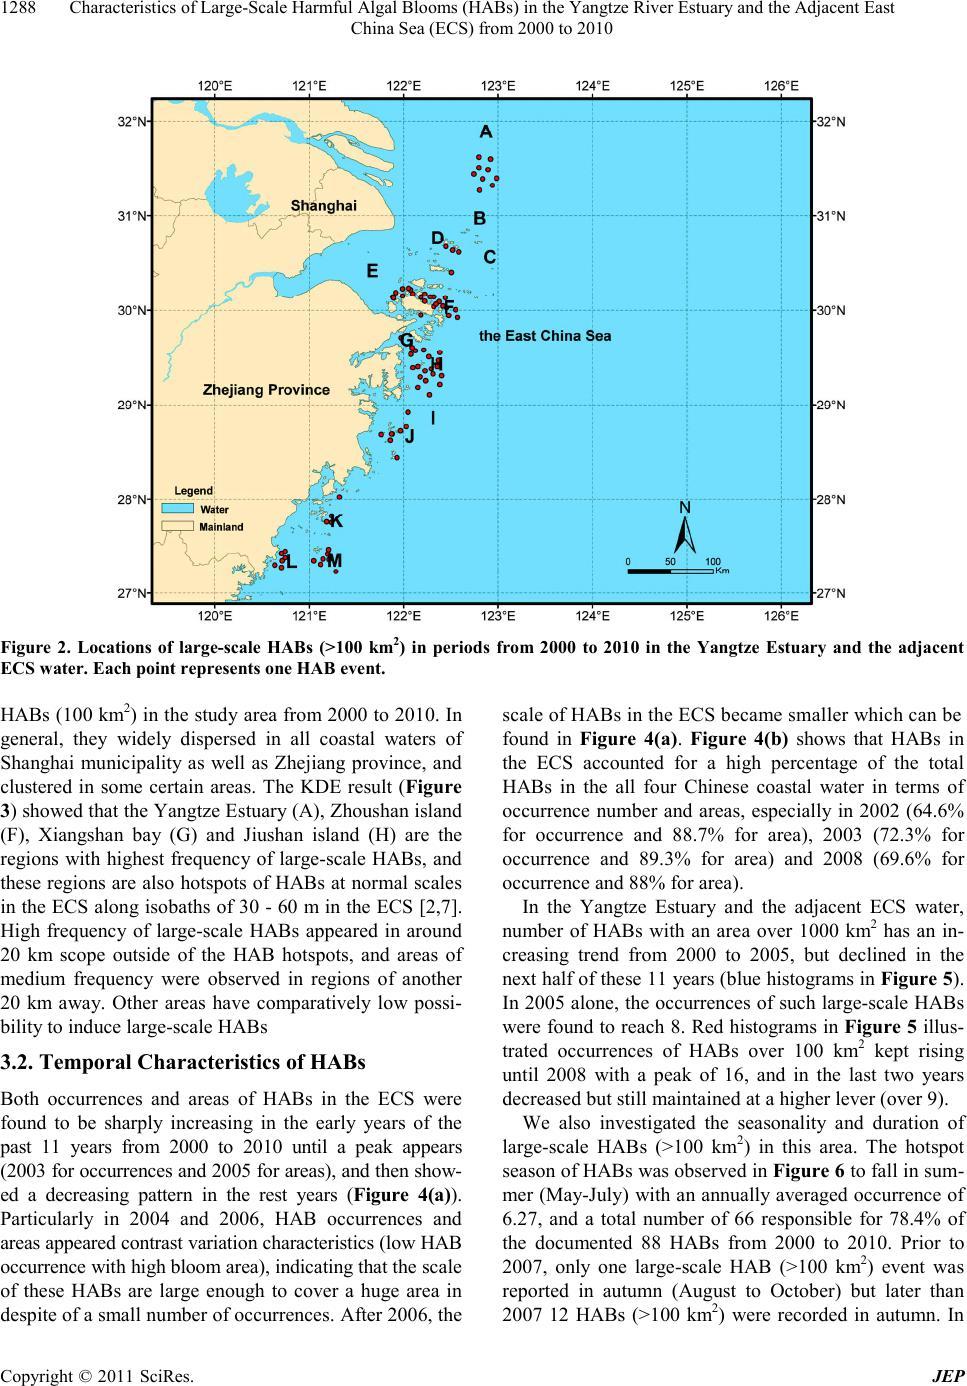 Characteristics of Large-Scale Harmful Algal Blooms (HABs